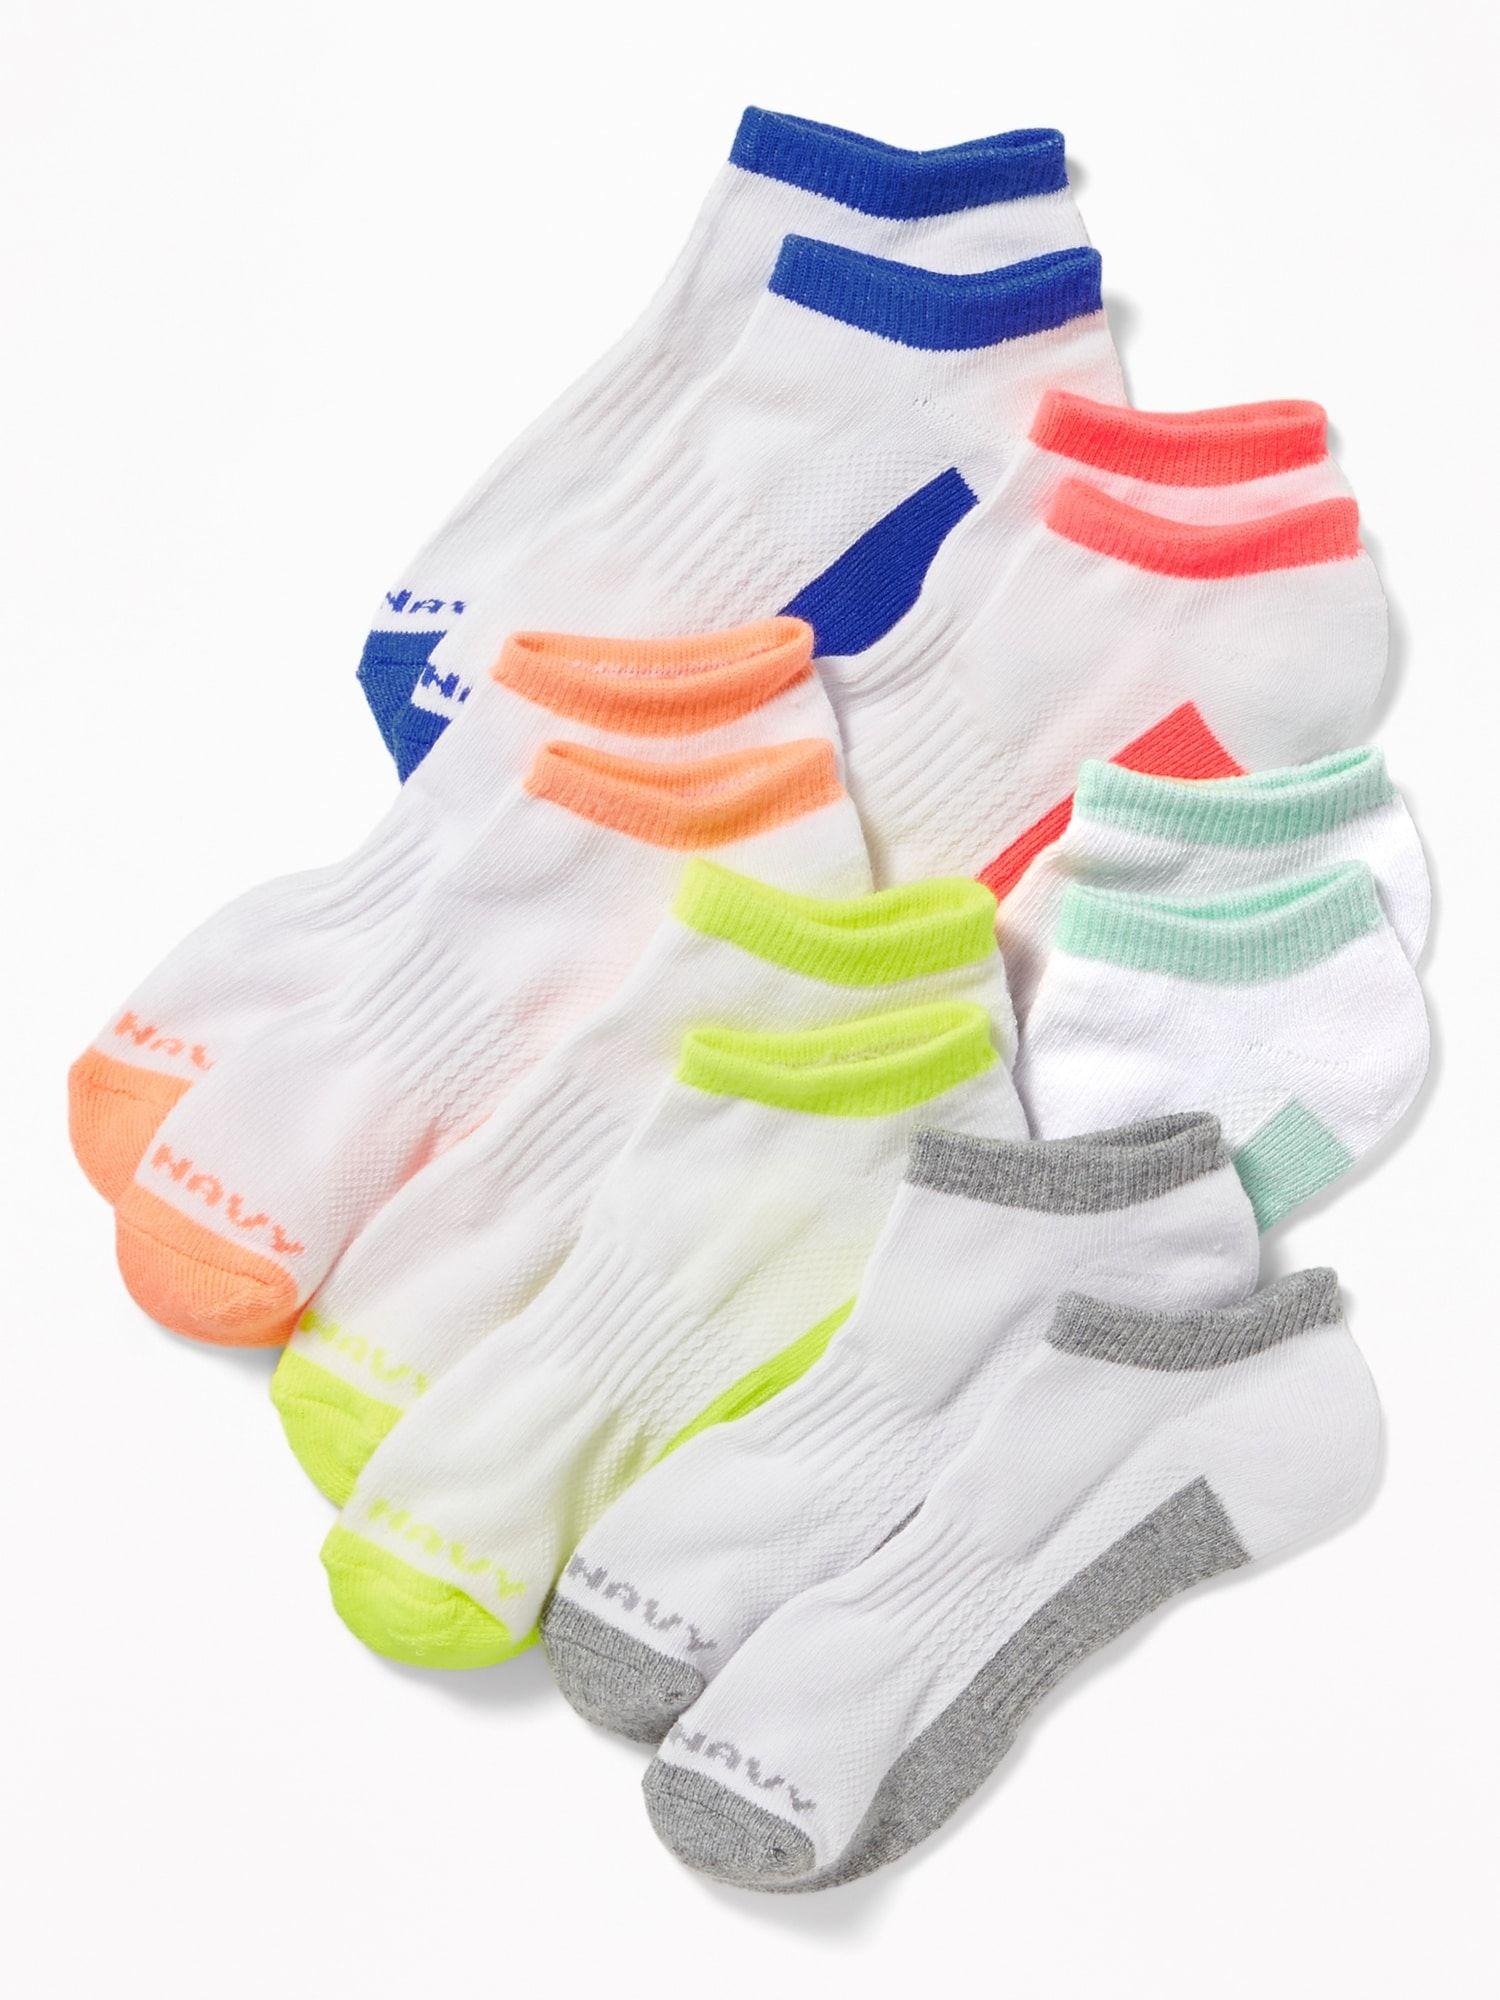 Athletic Sock 6-Pack for Girls | Old navy girls, Athletic socks, Old navy